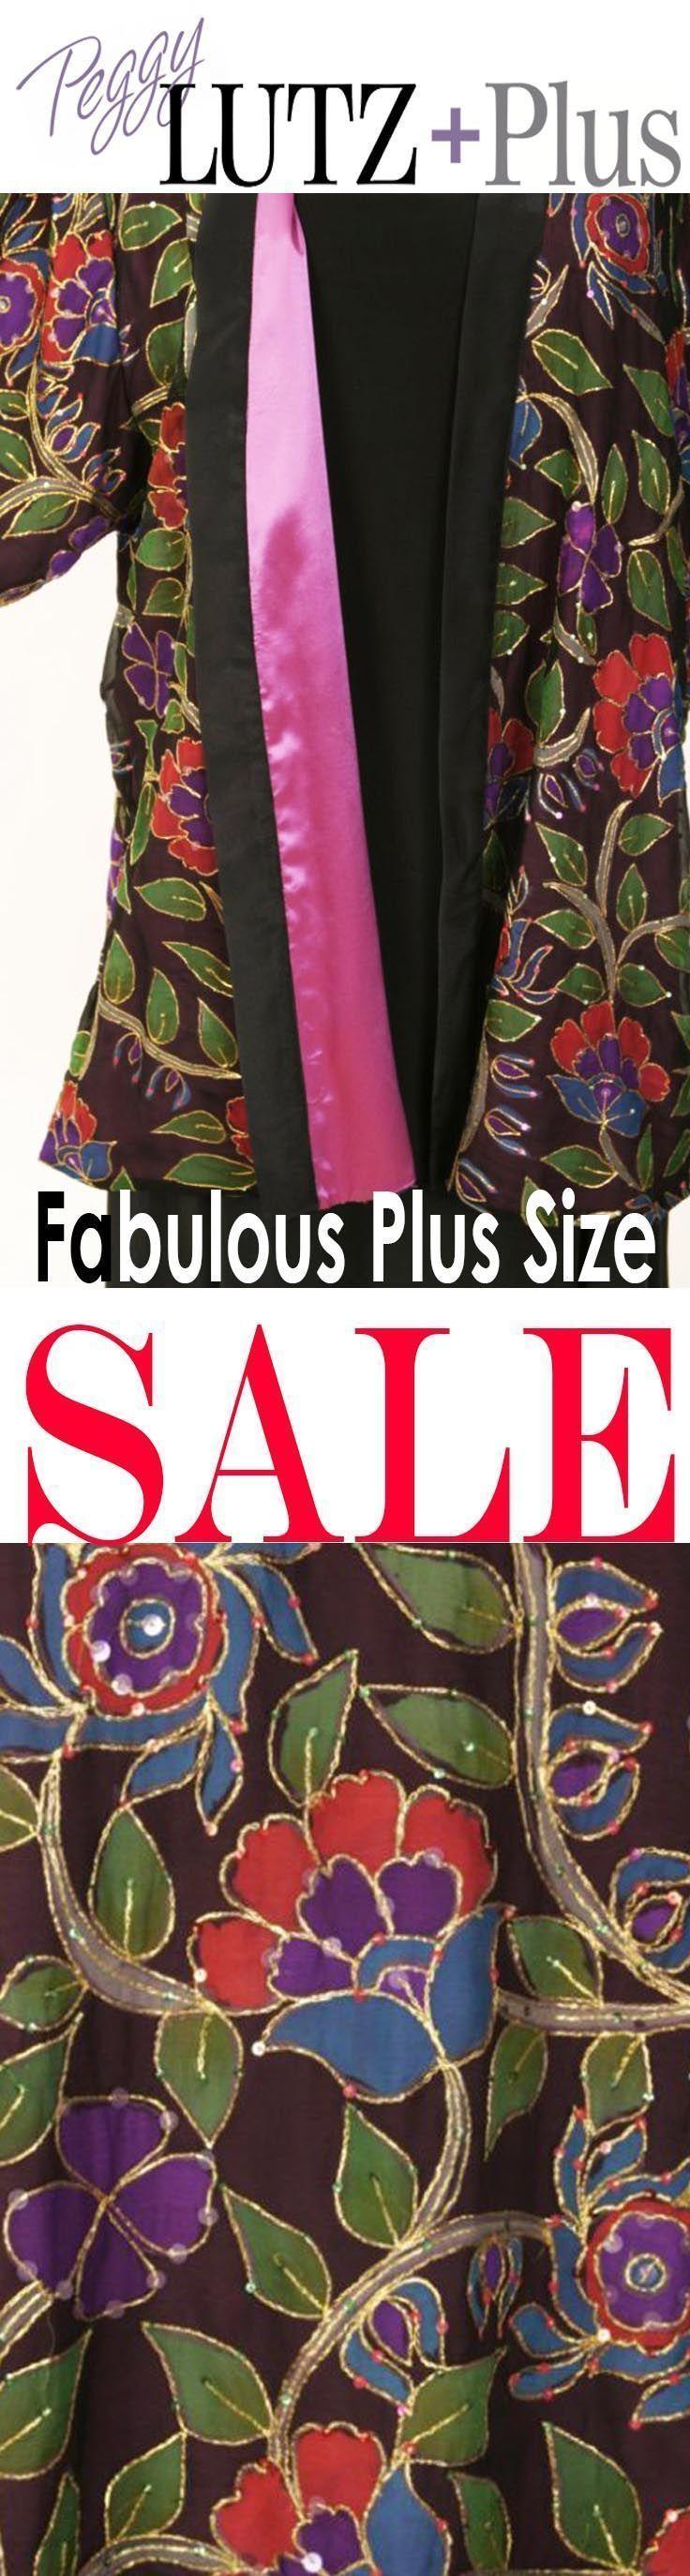 SHOP NOW: Unique jackets for women Sizes 14 - 36, mother of the bride, special occasion, artwear, elegant and unique women's clothing, xoPeg #PeggyLutzPlus #PlusSize #style #plussizestyle #plussizeclothing #plussizefashion  #plussizesale #womenstyle #womanstyle #womanfashion #weddingstyle #fashion #formal #evening #coats #style #couture #elegantwoman #elegantplus #uniquejackets #divastyle #jackets